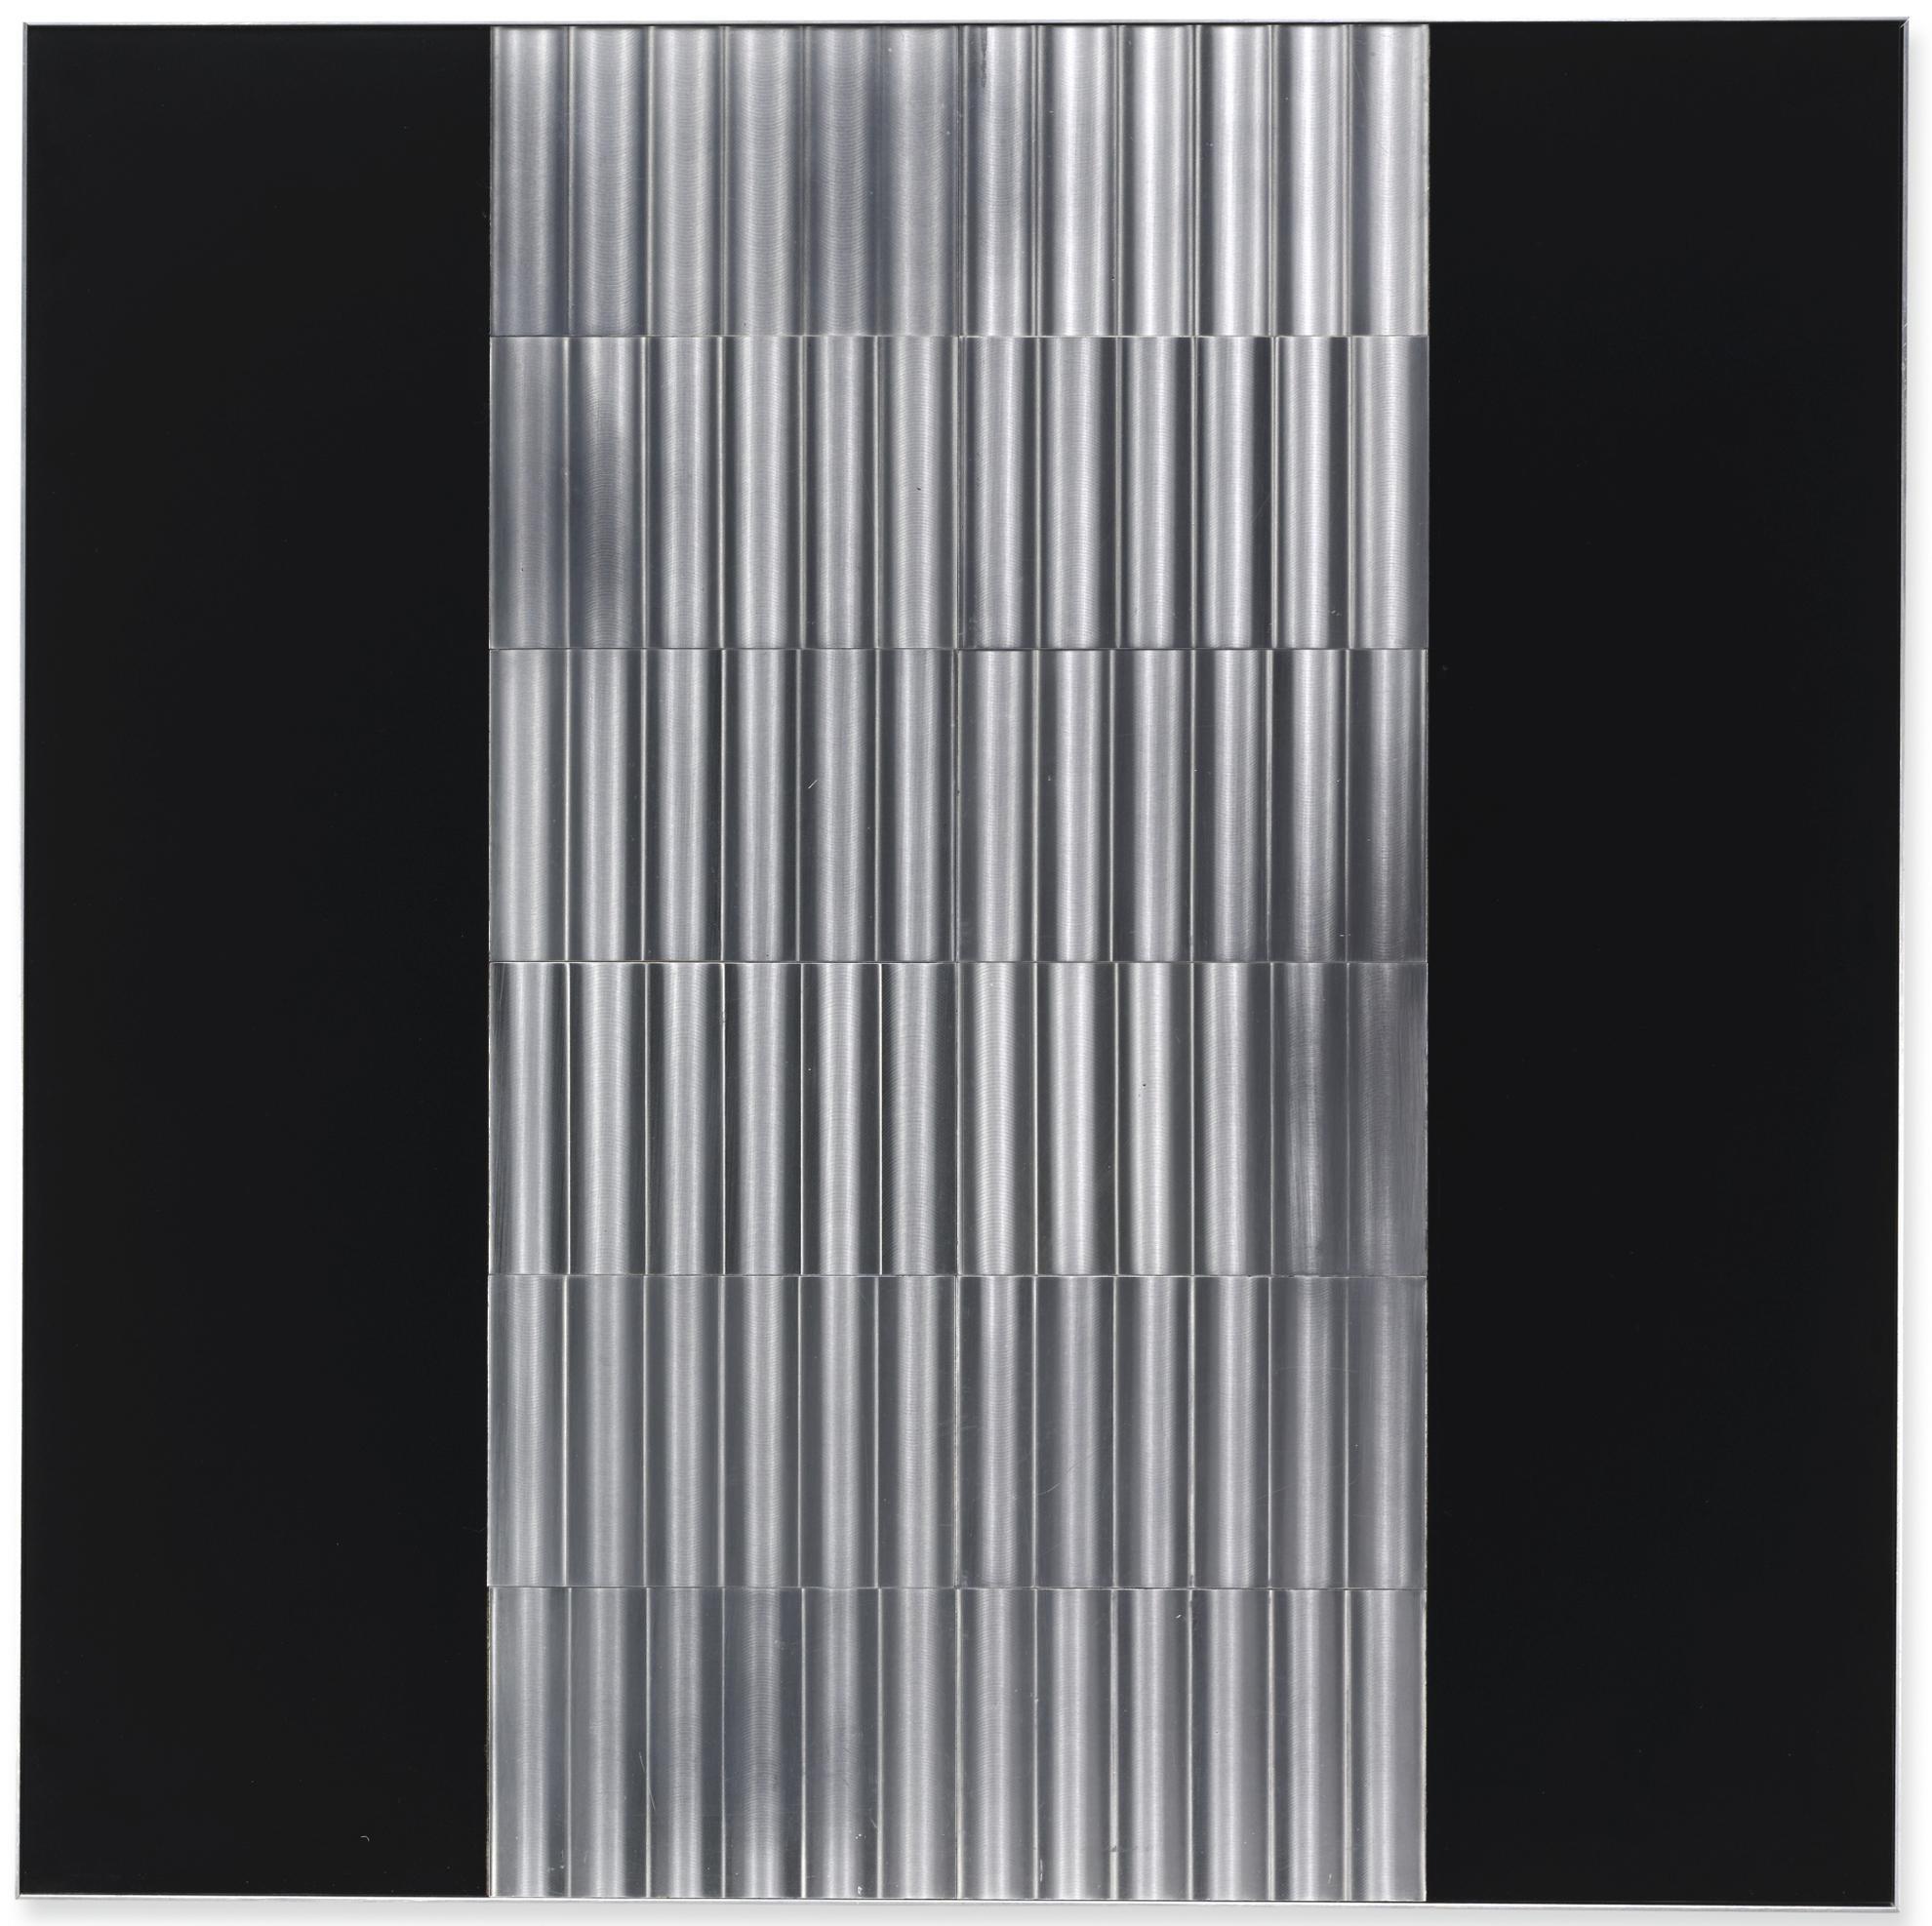 Getulio Alviani-Superficie A Testura Vibratile-1971